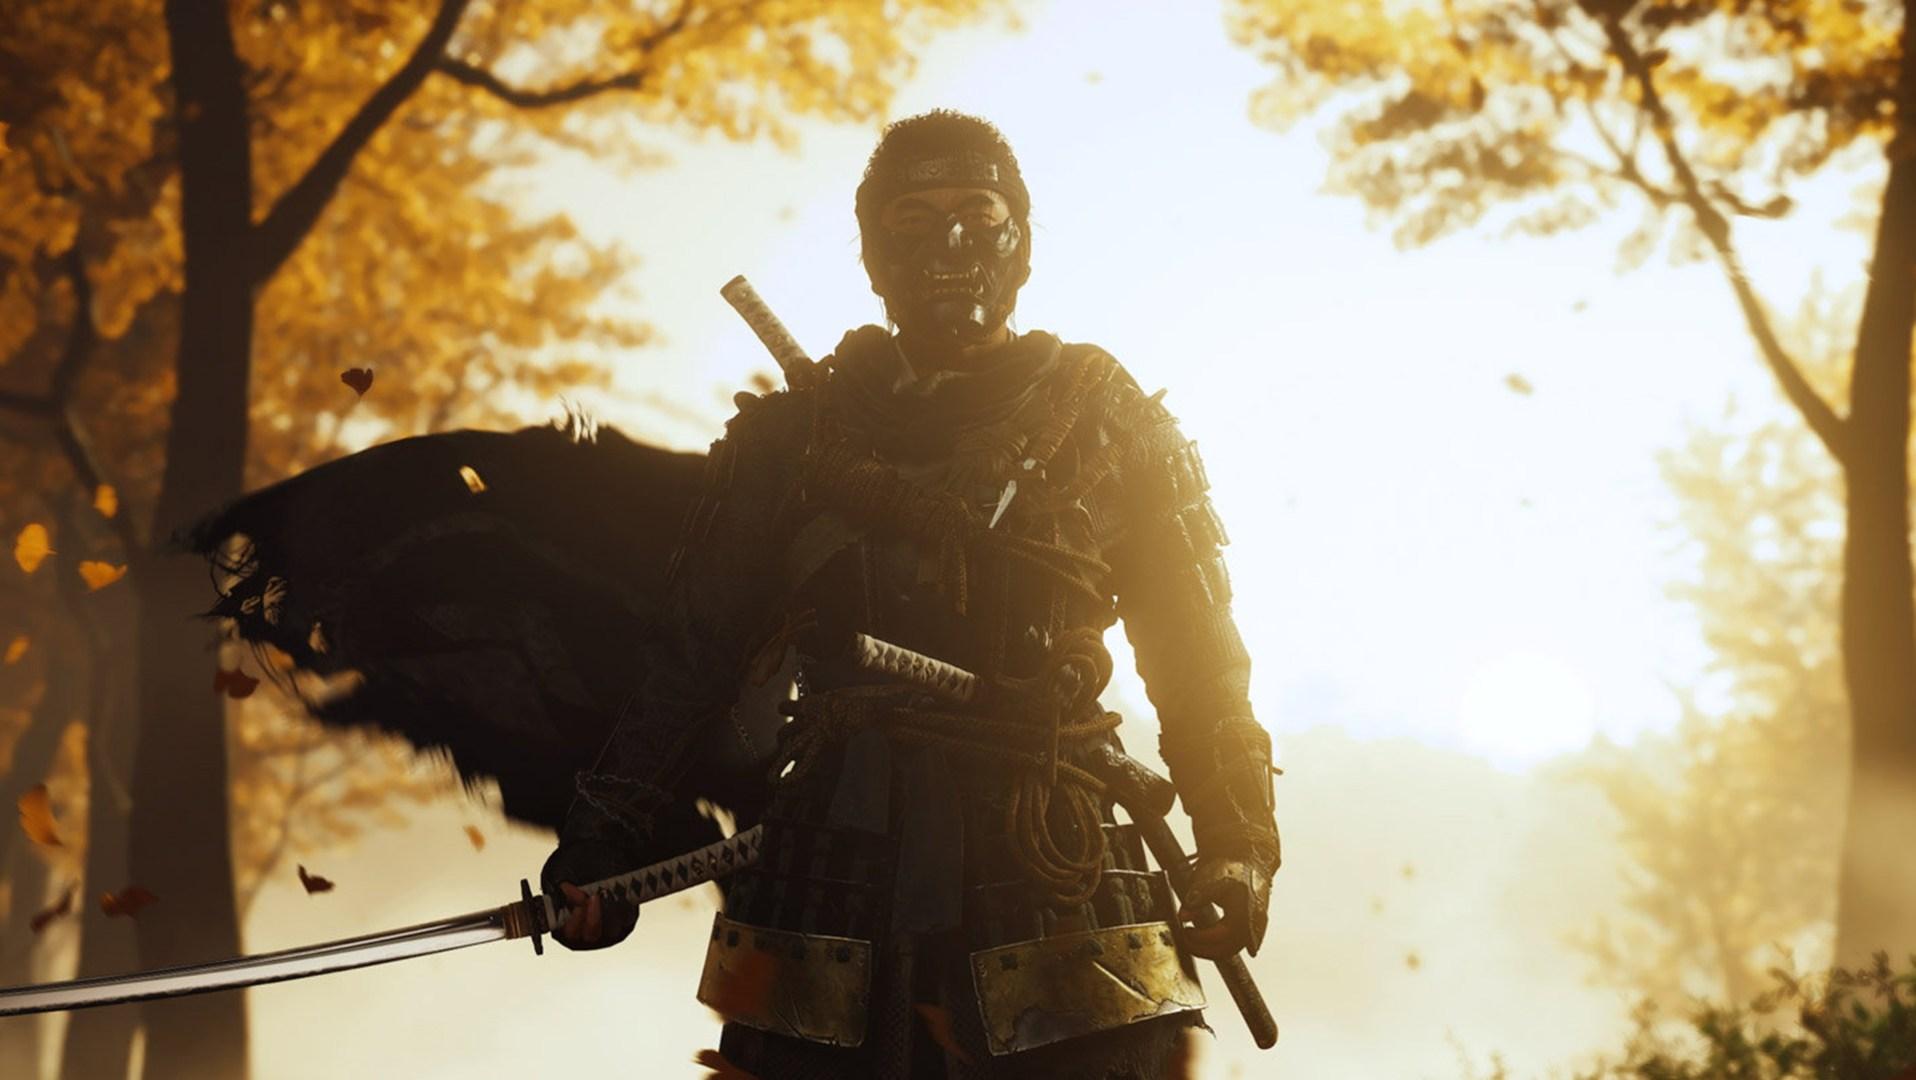 Quelle: SIE - Ghost of Tsushima - Jin Sakai mit Samurai Maske